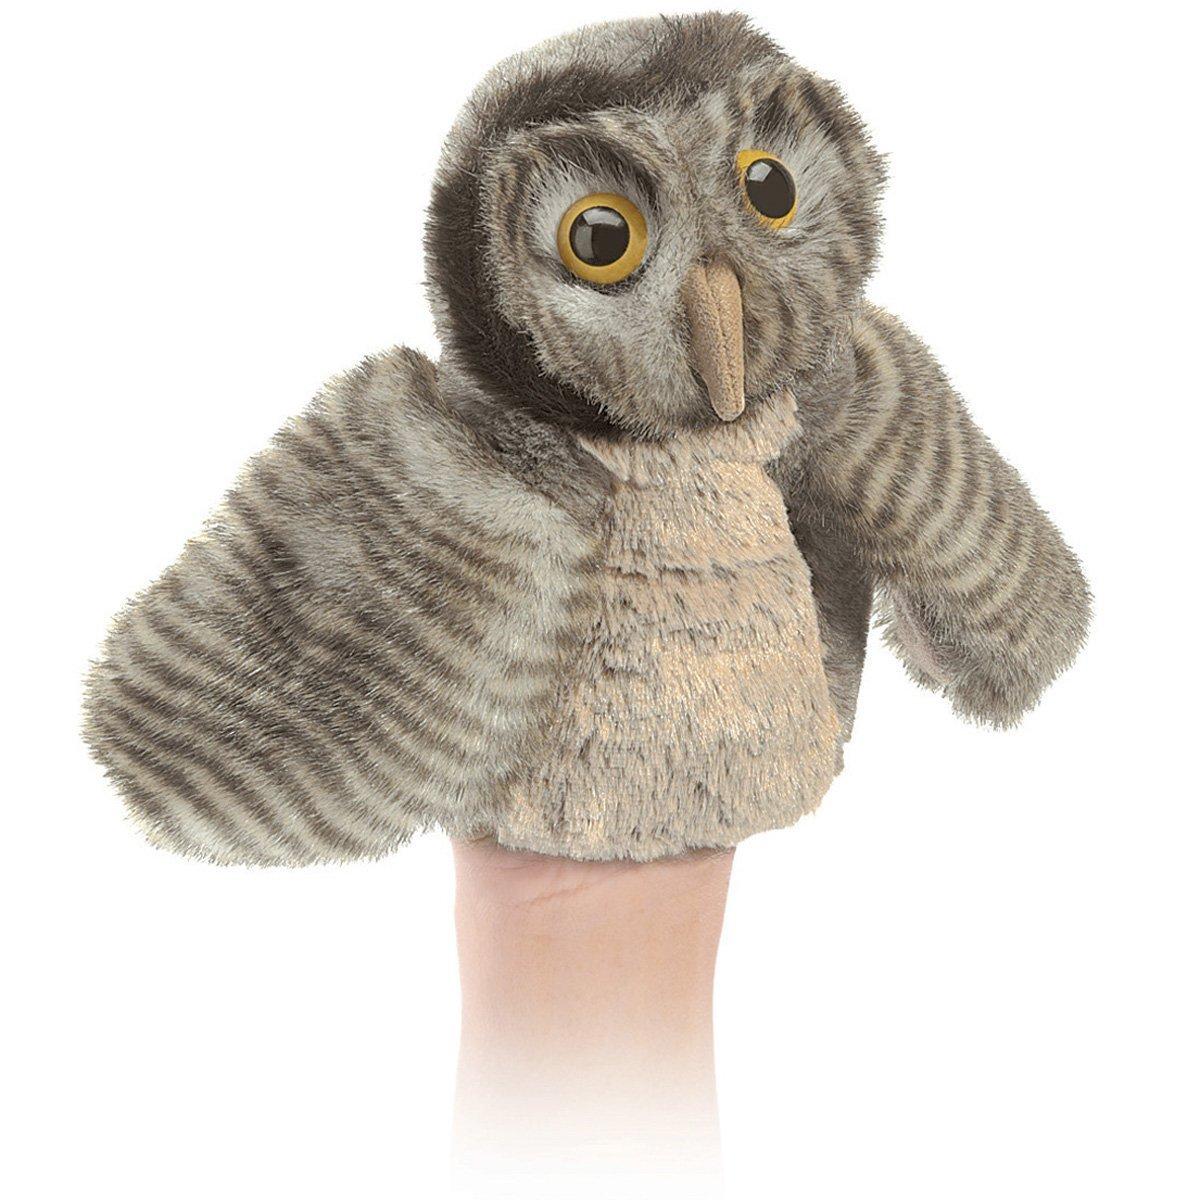 Folkmanis Hand Puppet - Little Owl image